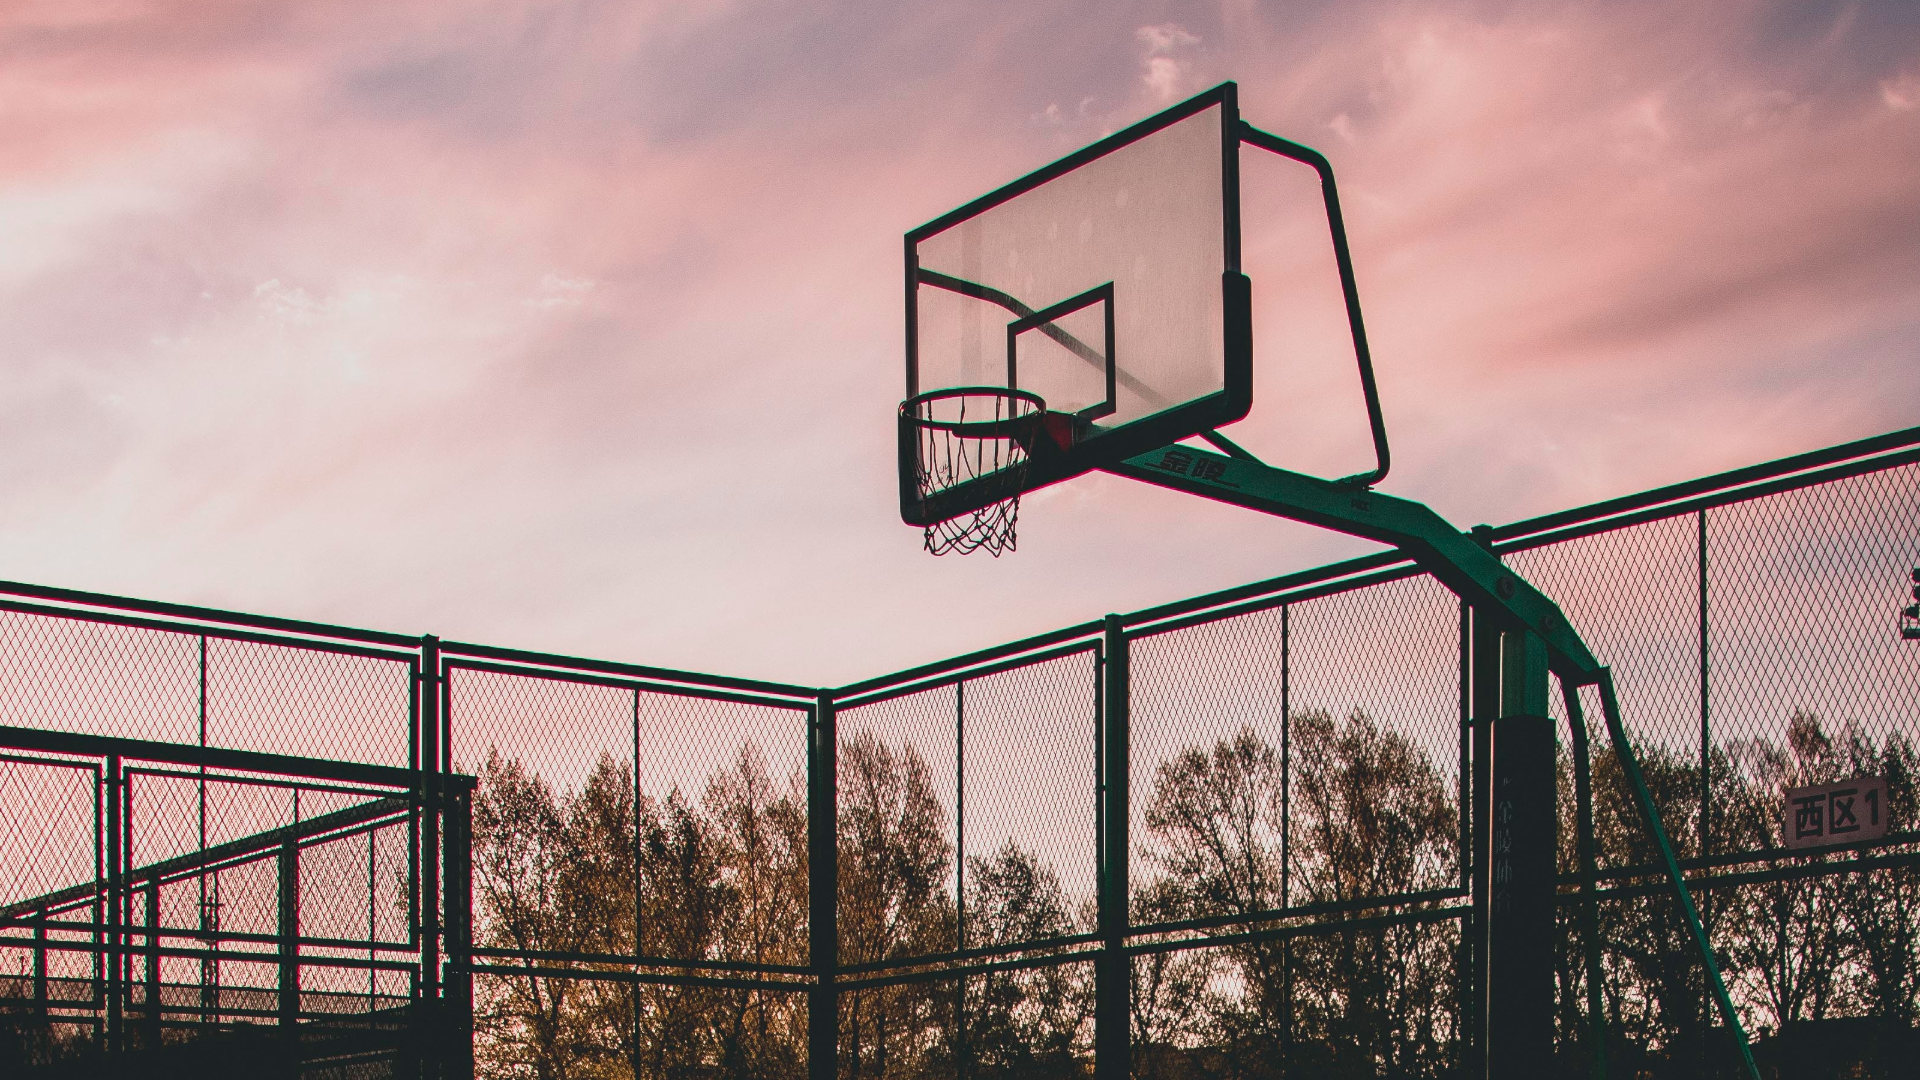 gelorabasketballclub